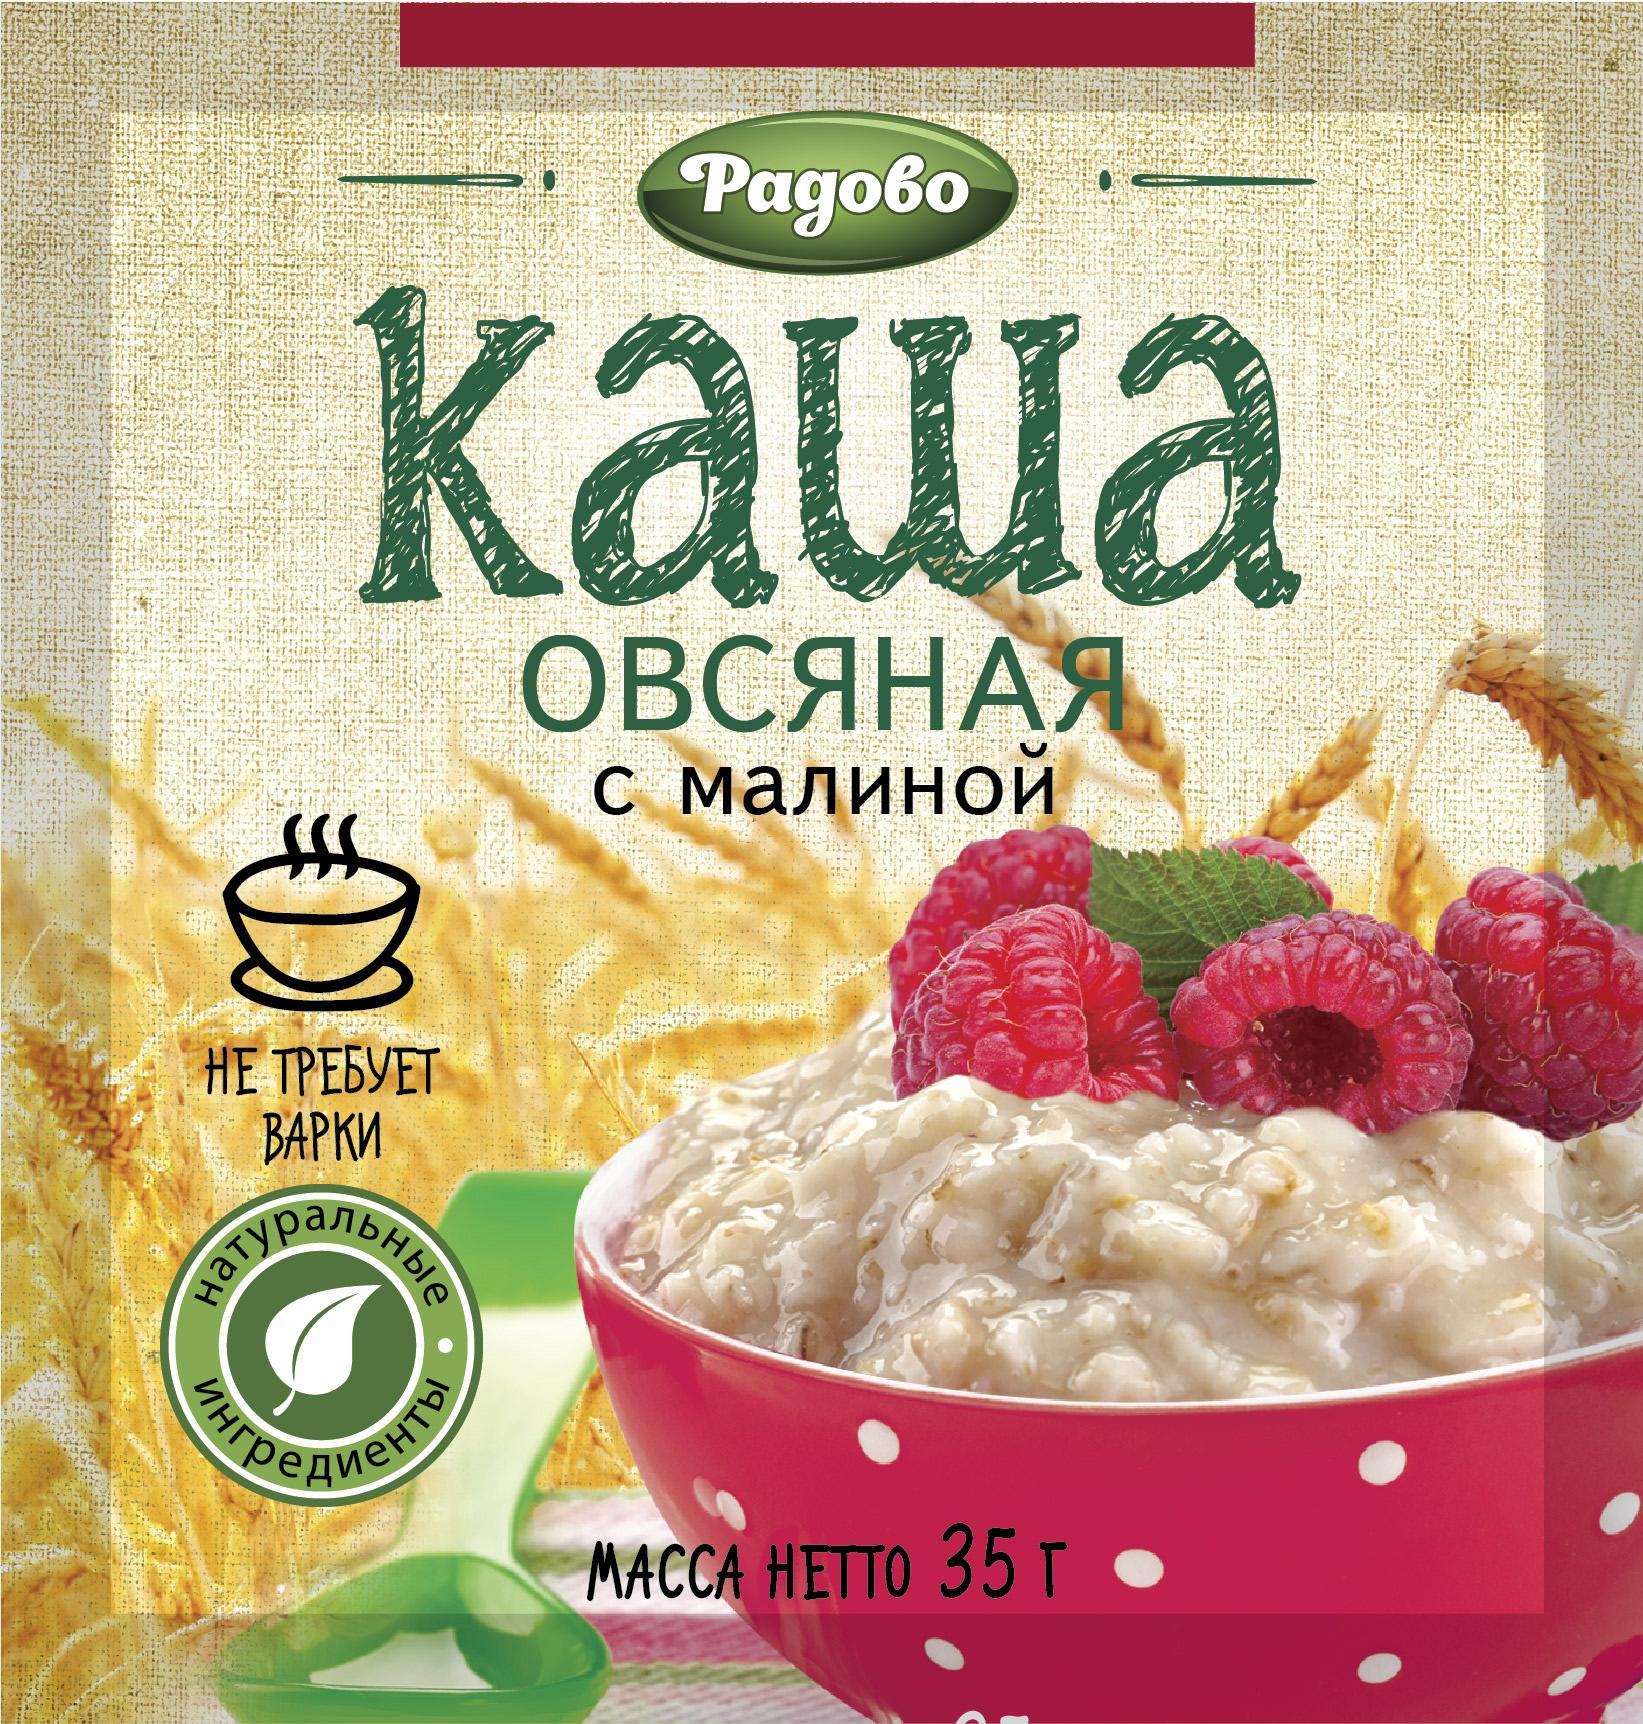 Paket_kasha_malina 120x125.jpg